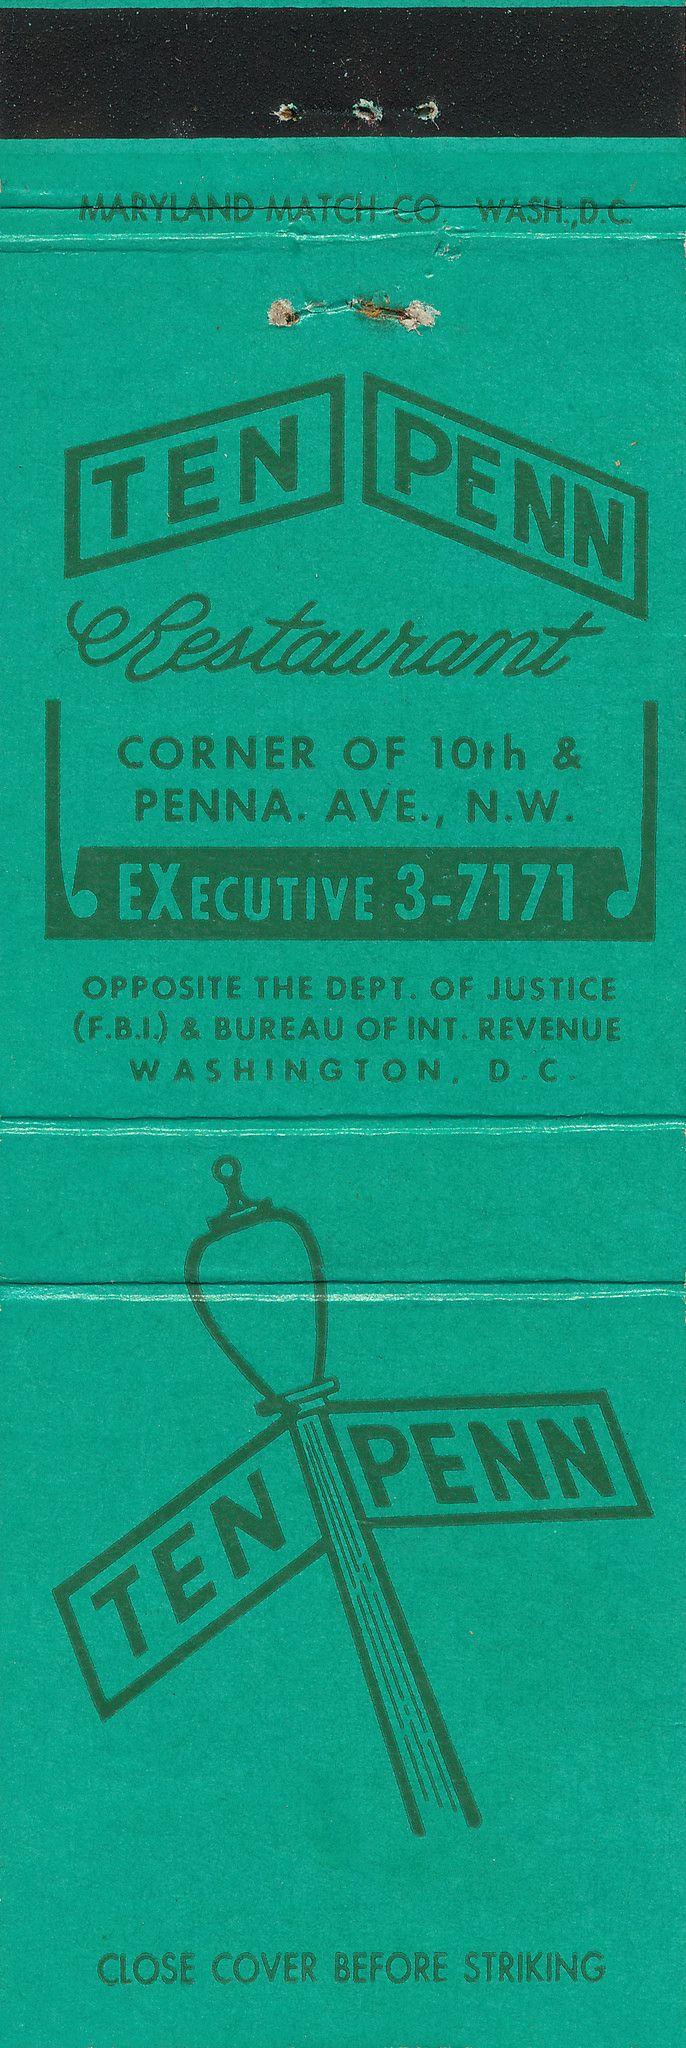 136 best Historic Washington DC matchbook covers images on Pinterest